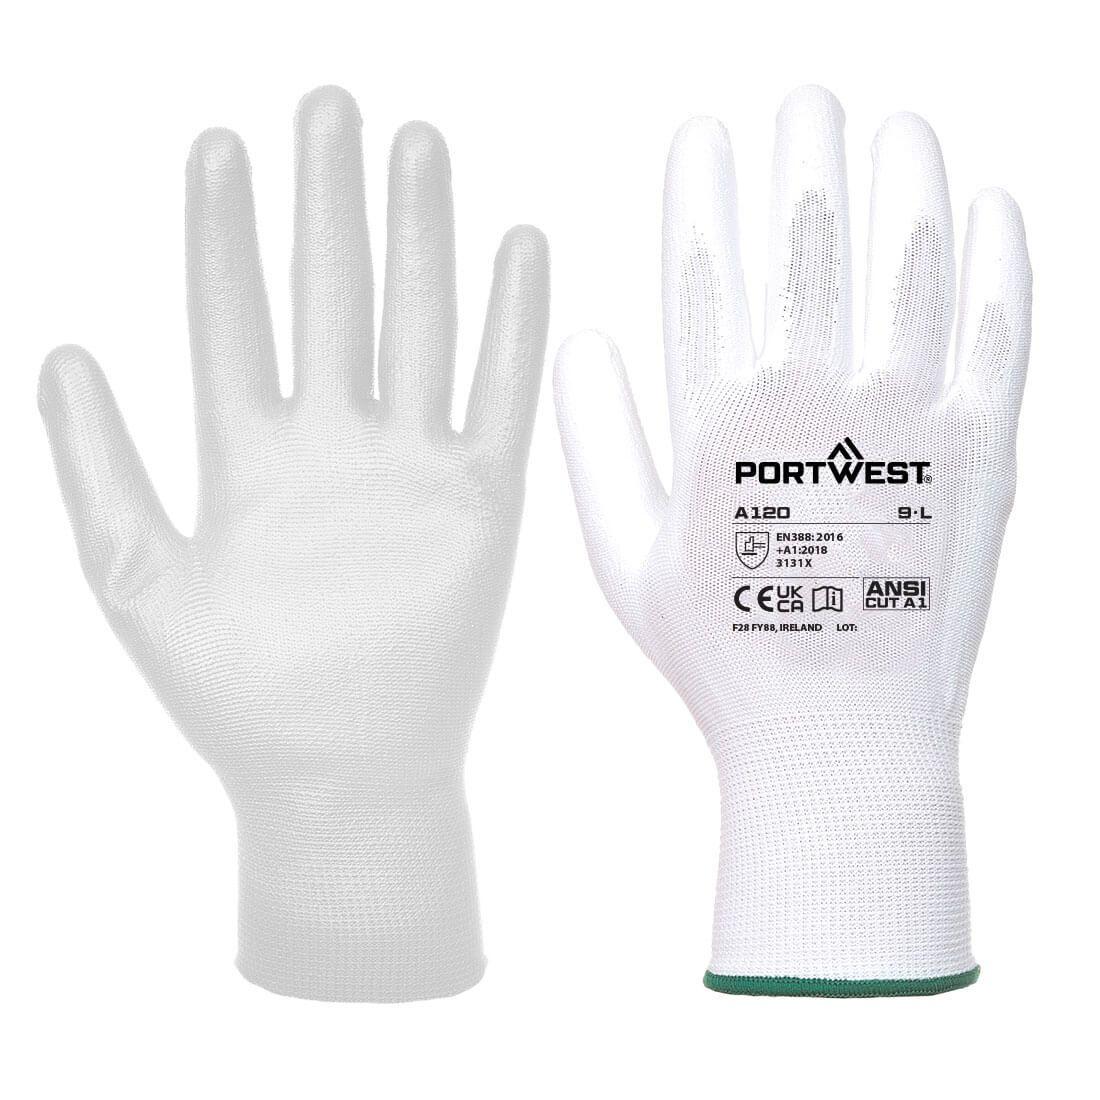 Portwest Handschoenen A120 wit(WH)